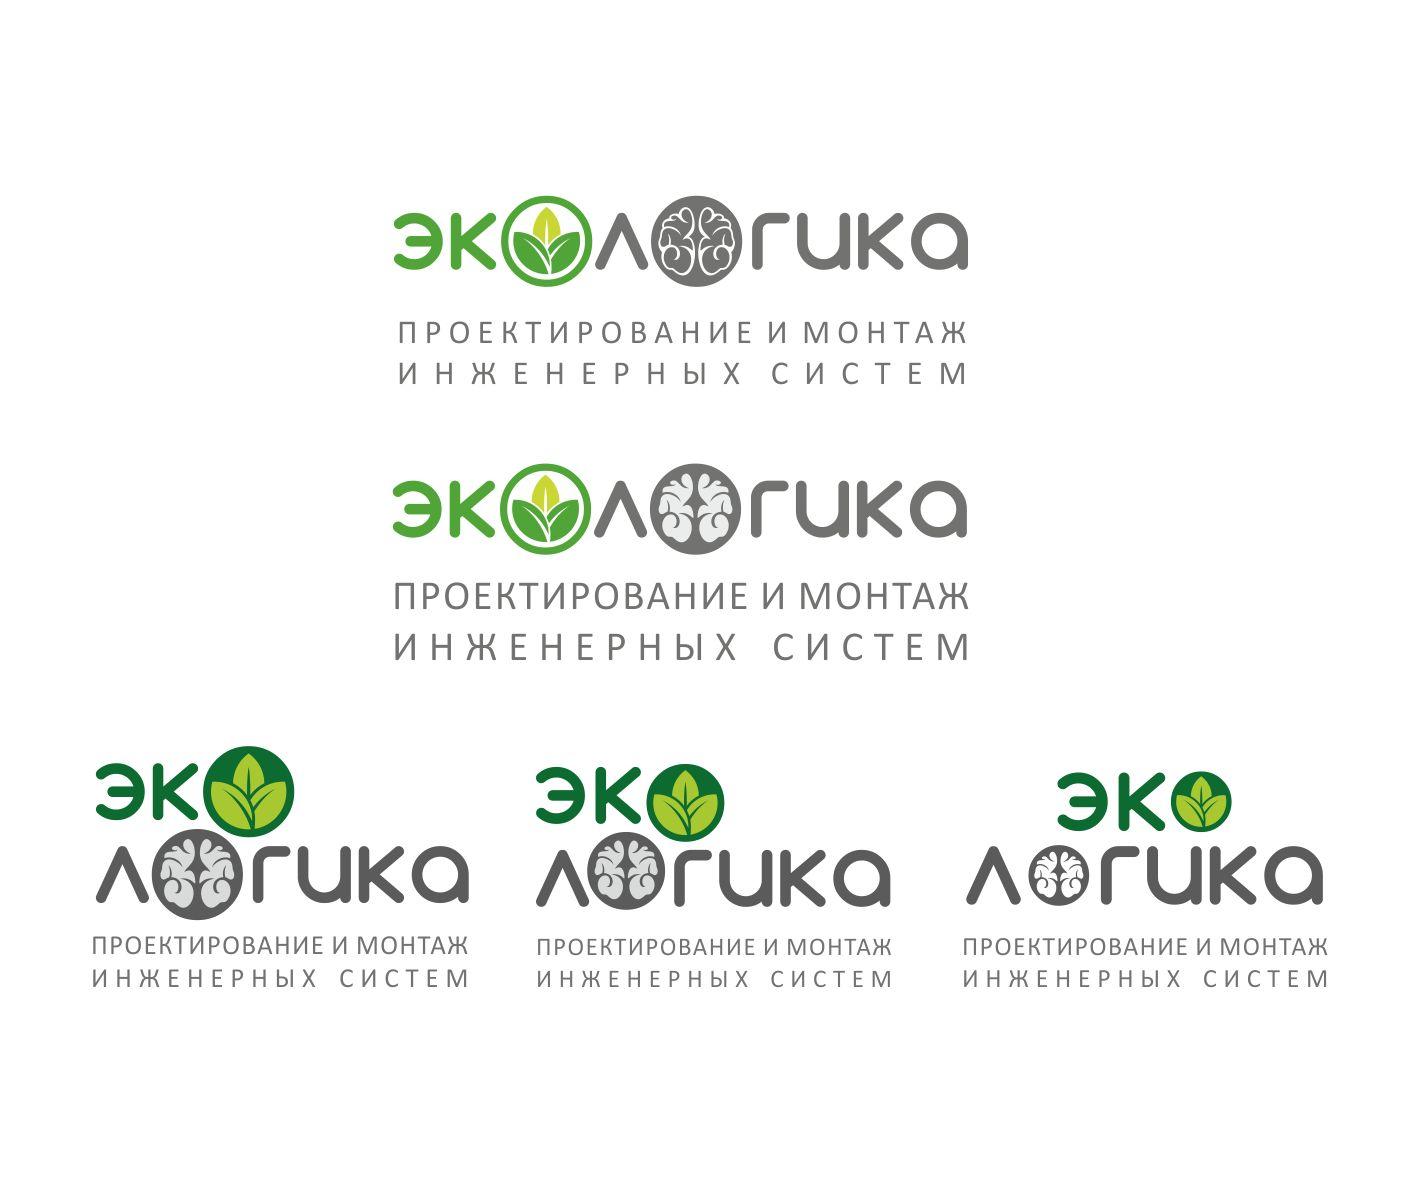 Логотип ЭКОЛОГИКА фото f_644593ee4a56d7b3.jpg